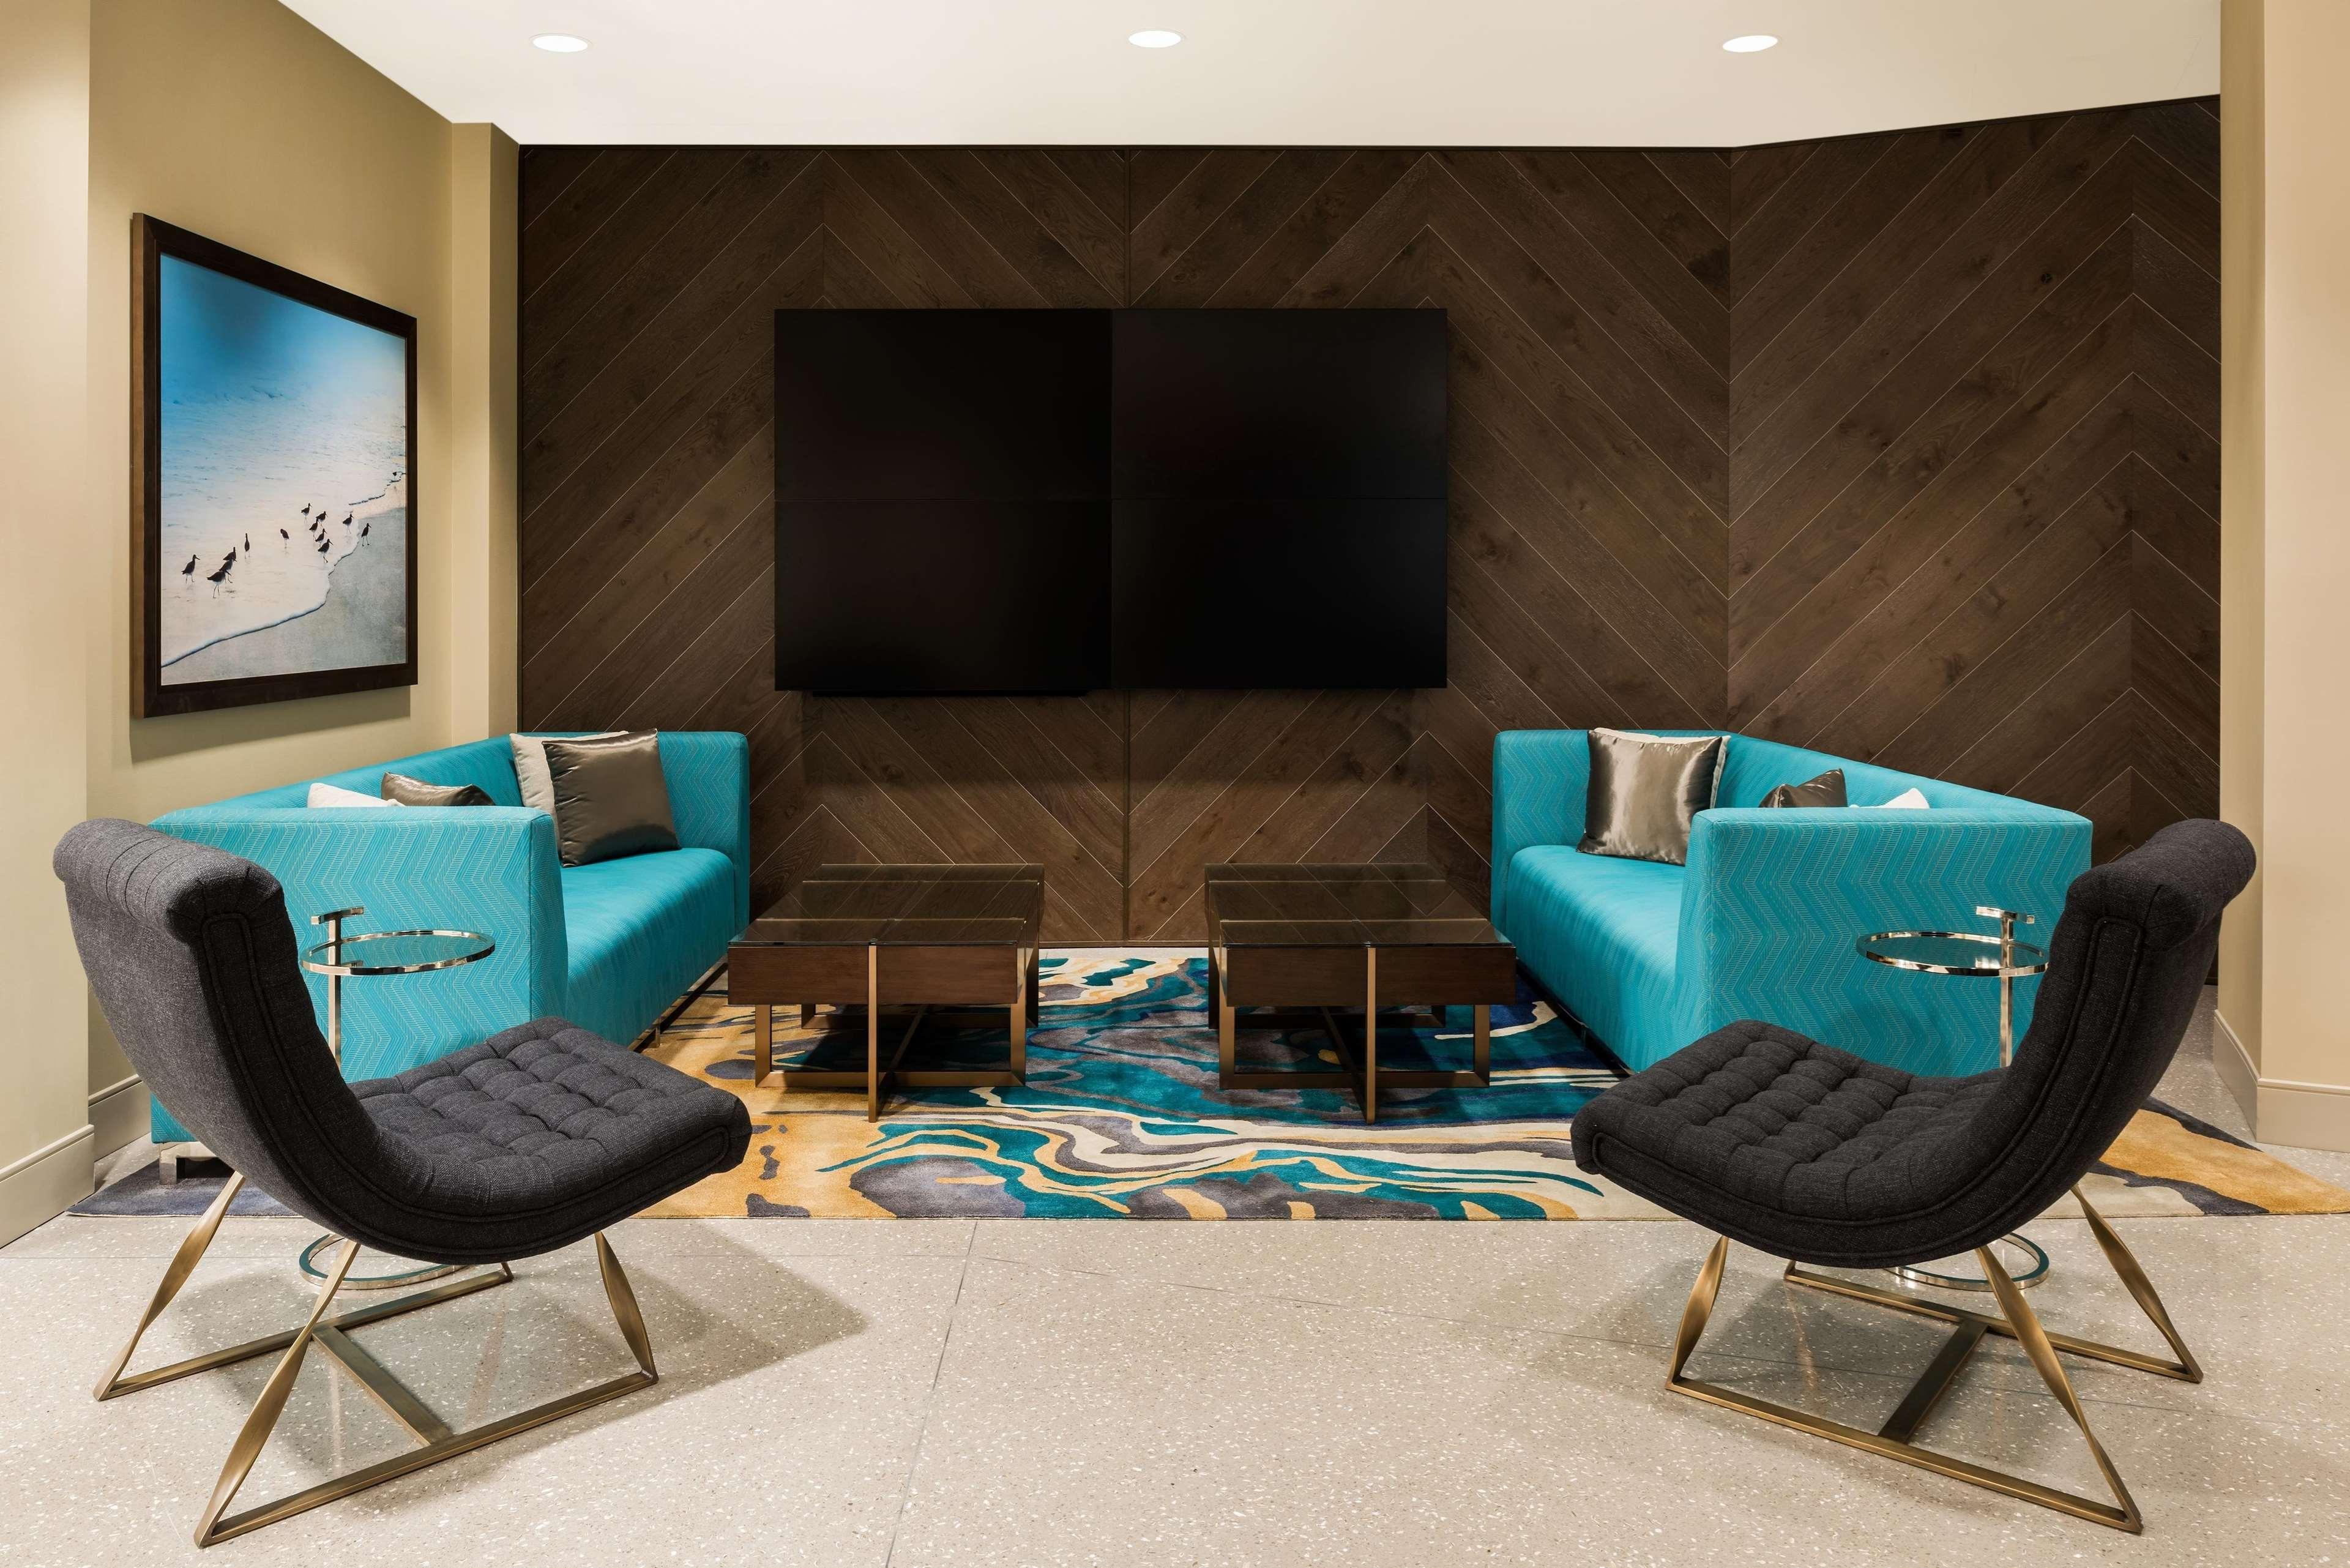 Hilton Garden Inn Miami Dolphin Mall 1695 NW 111th Ave Suite A ...